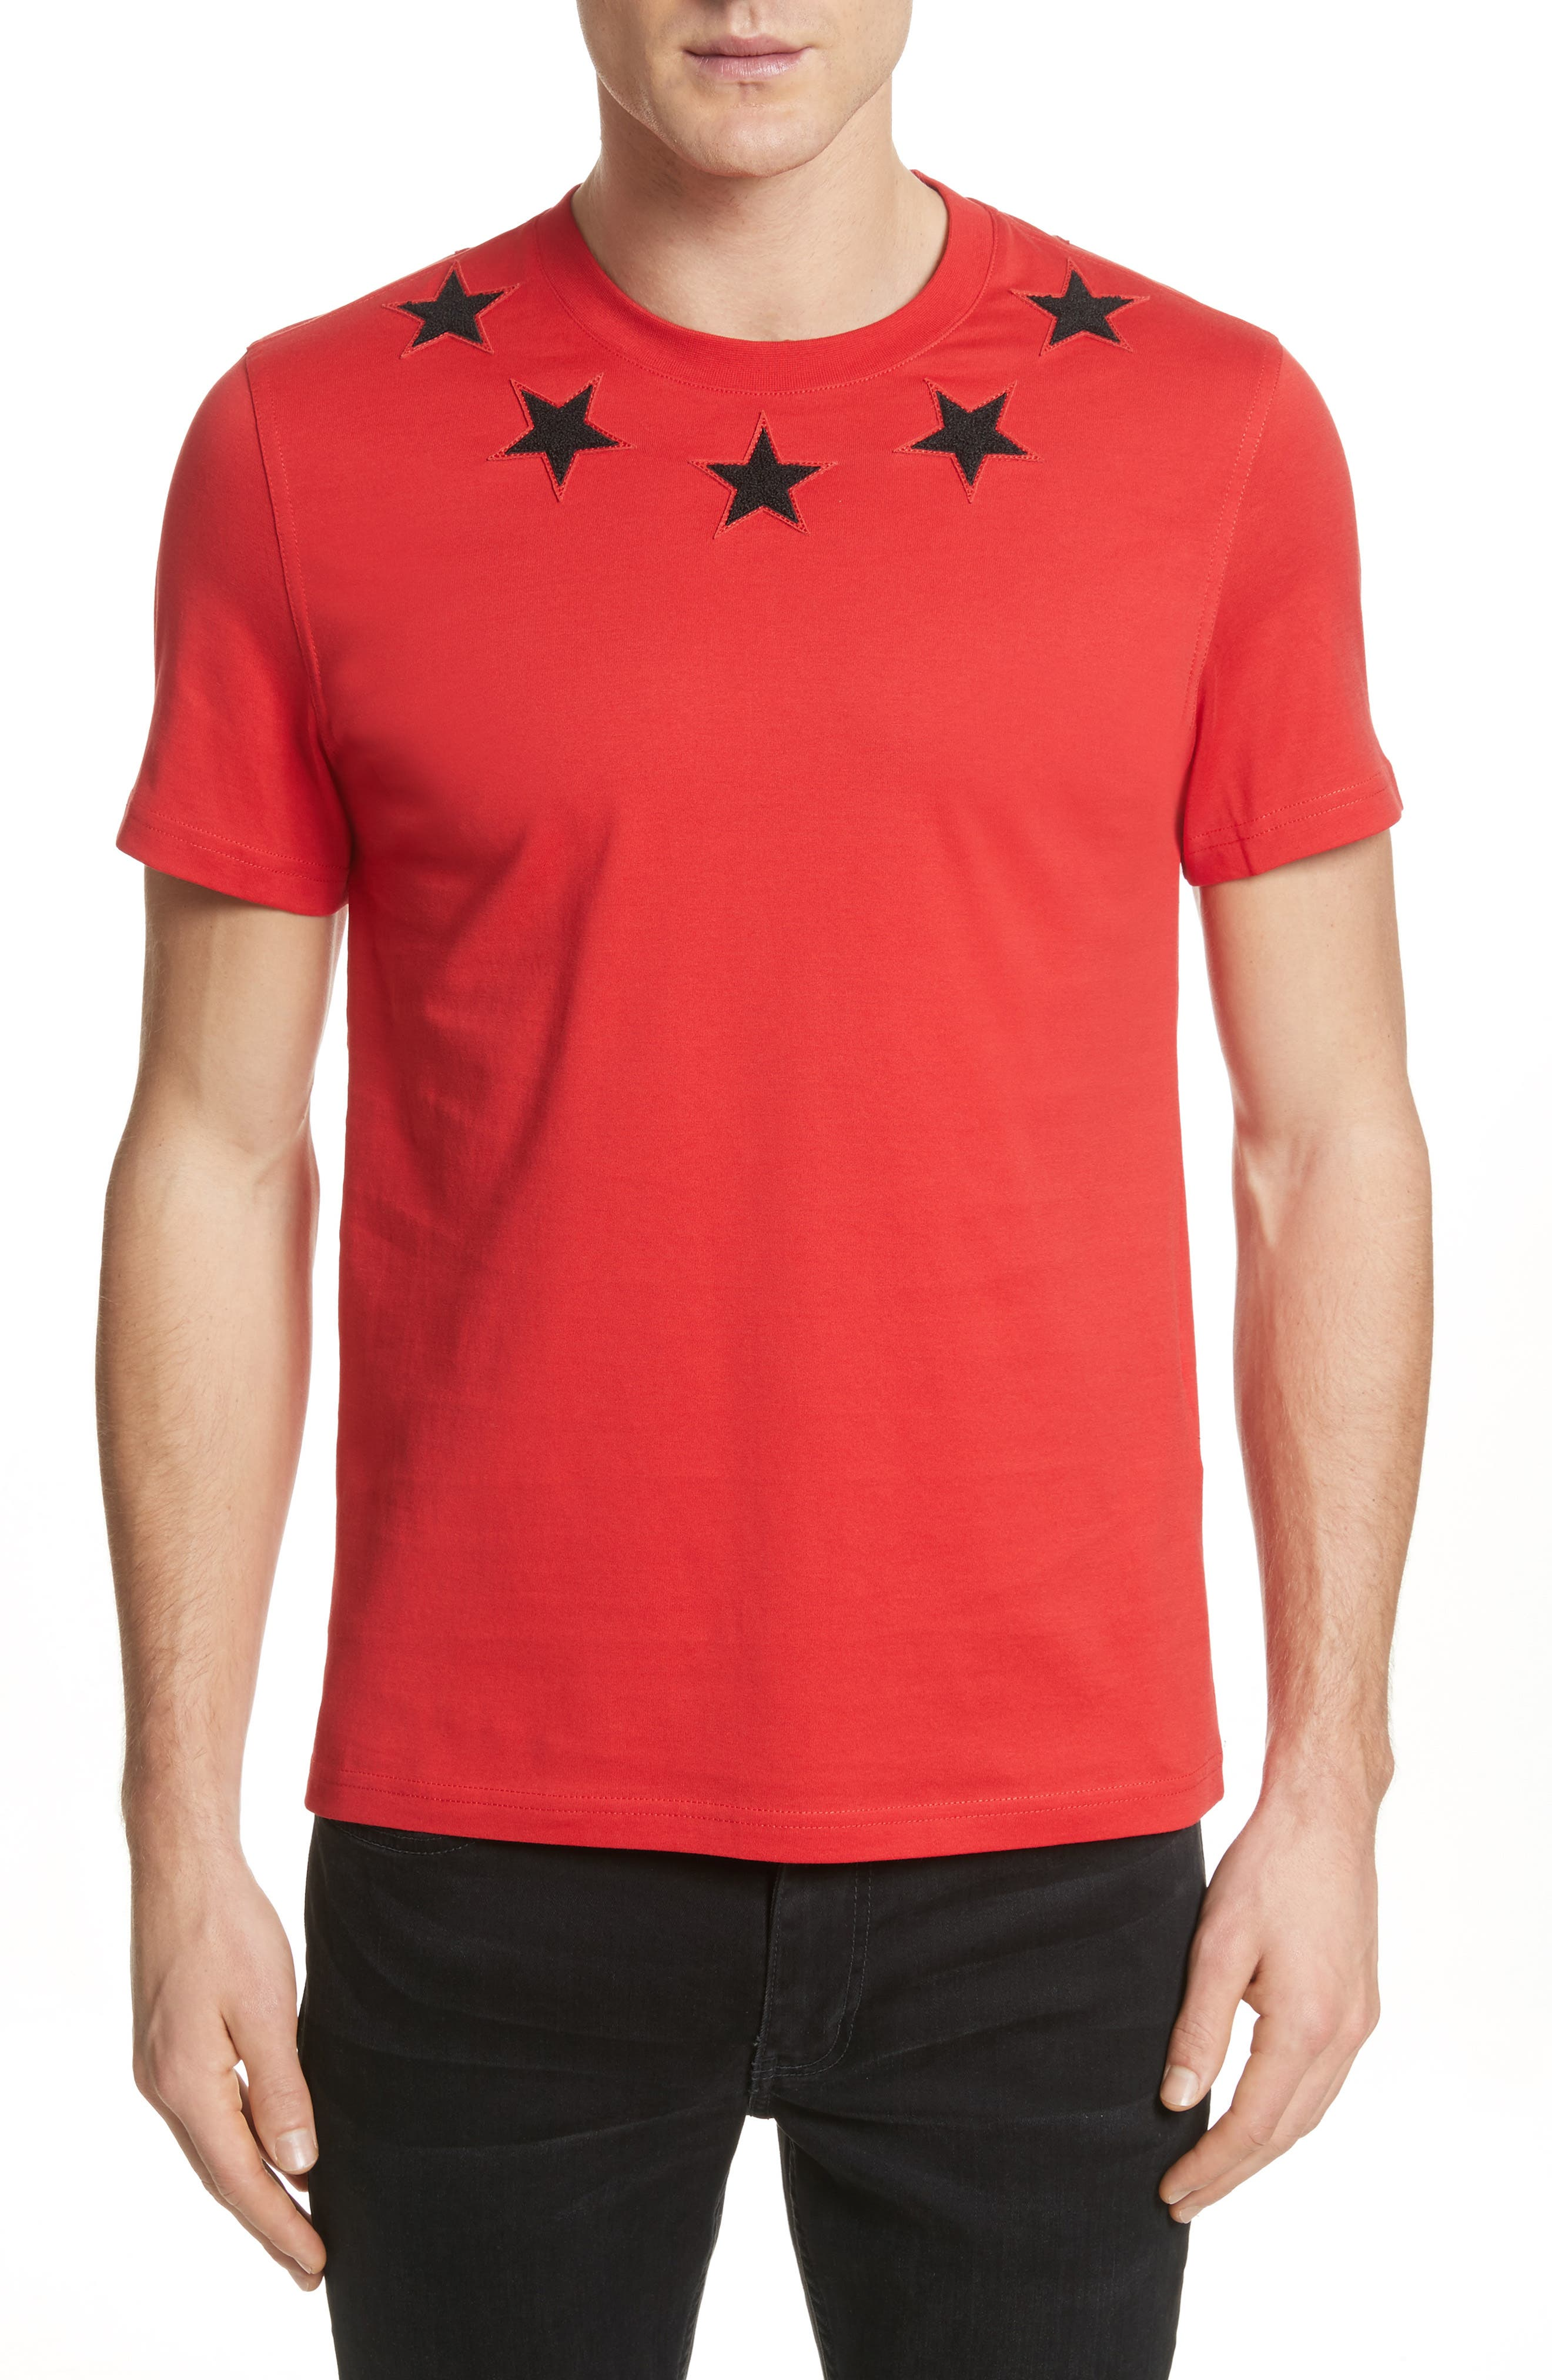 Givenchy Star Appliqué T-Shirt